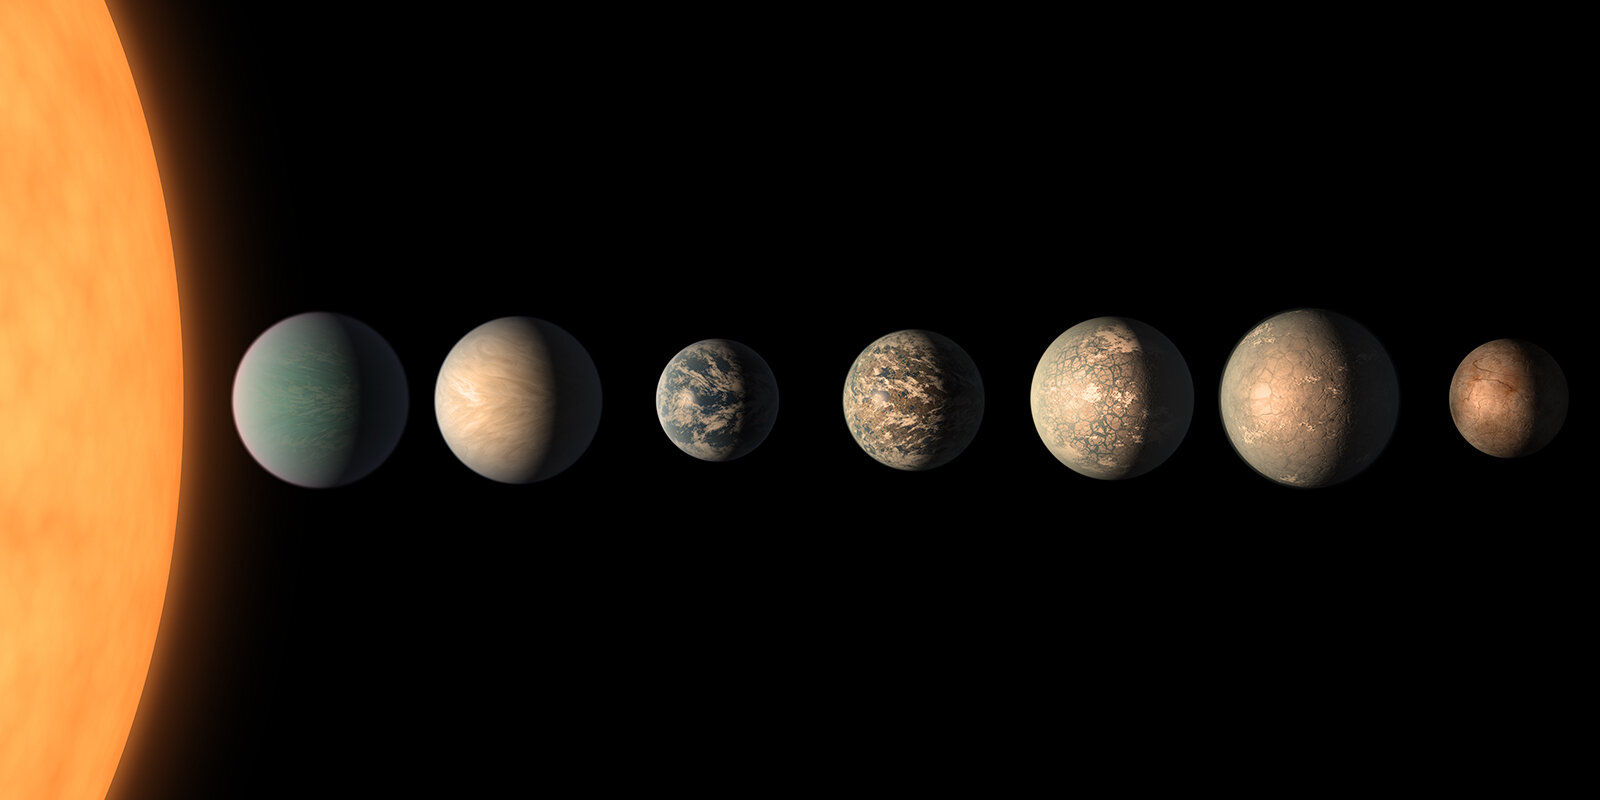 nekotorie-ekzoplaneti-lucse-podxodat-dla-jizni--cem-zemla--viasnili-ucenie